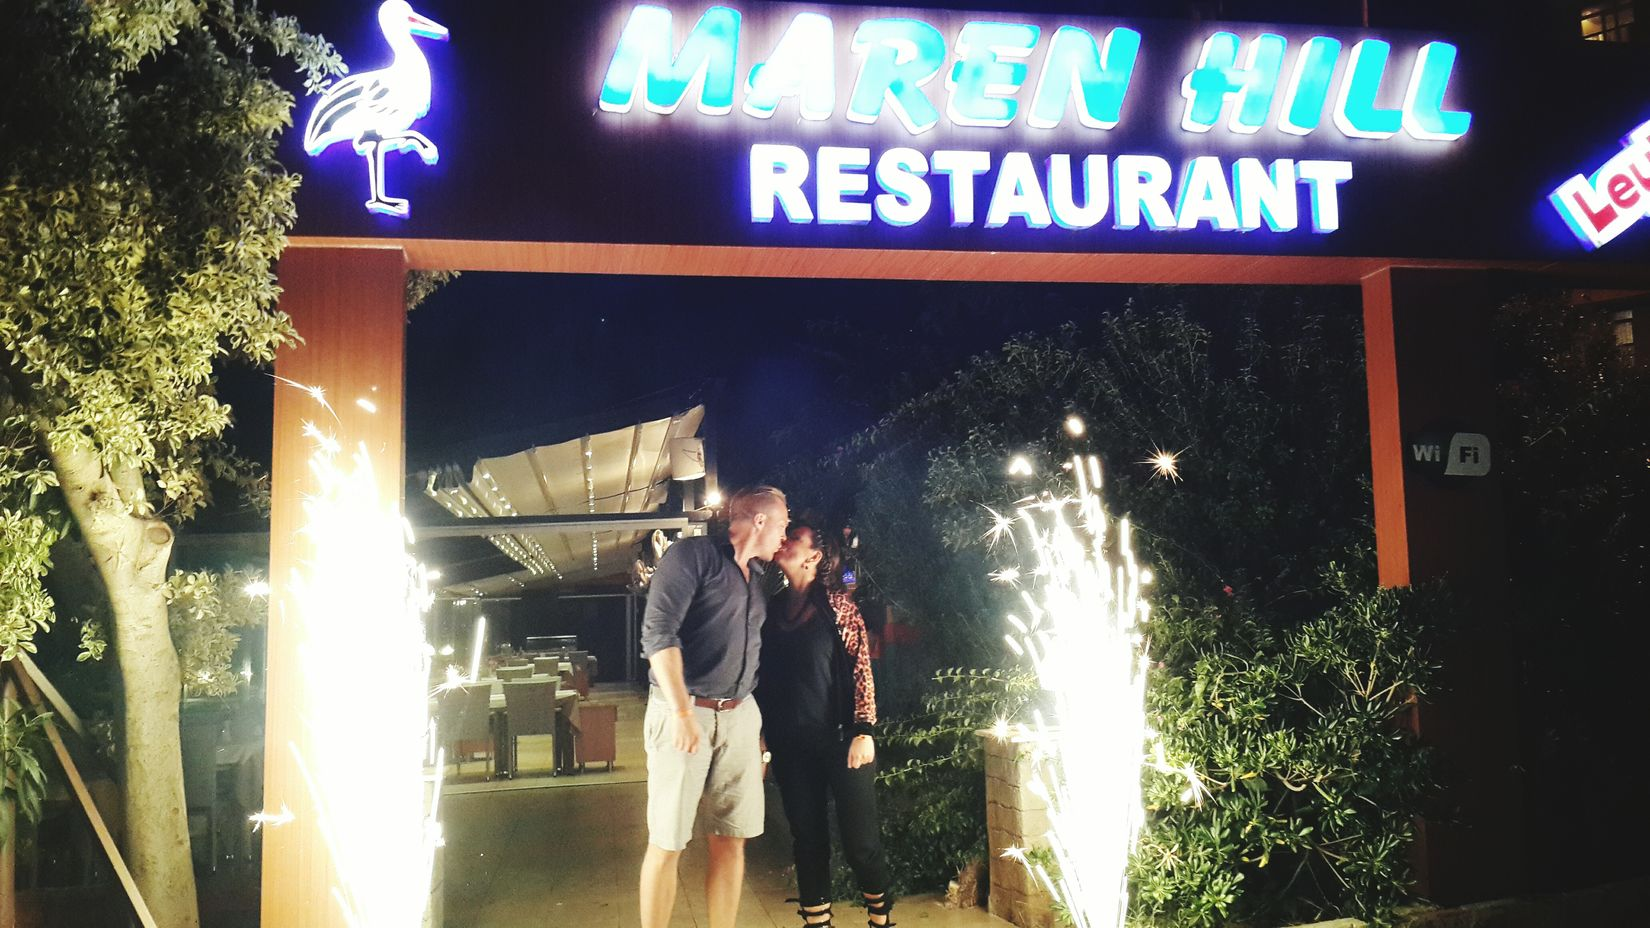 Alanya Maren Hill Restaurant Alanya Castle Alanya Türkiye Alanya